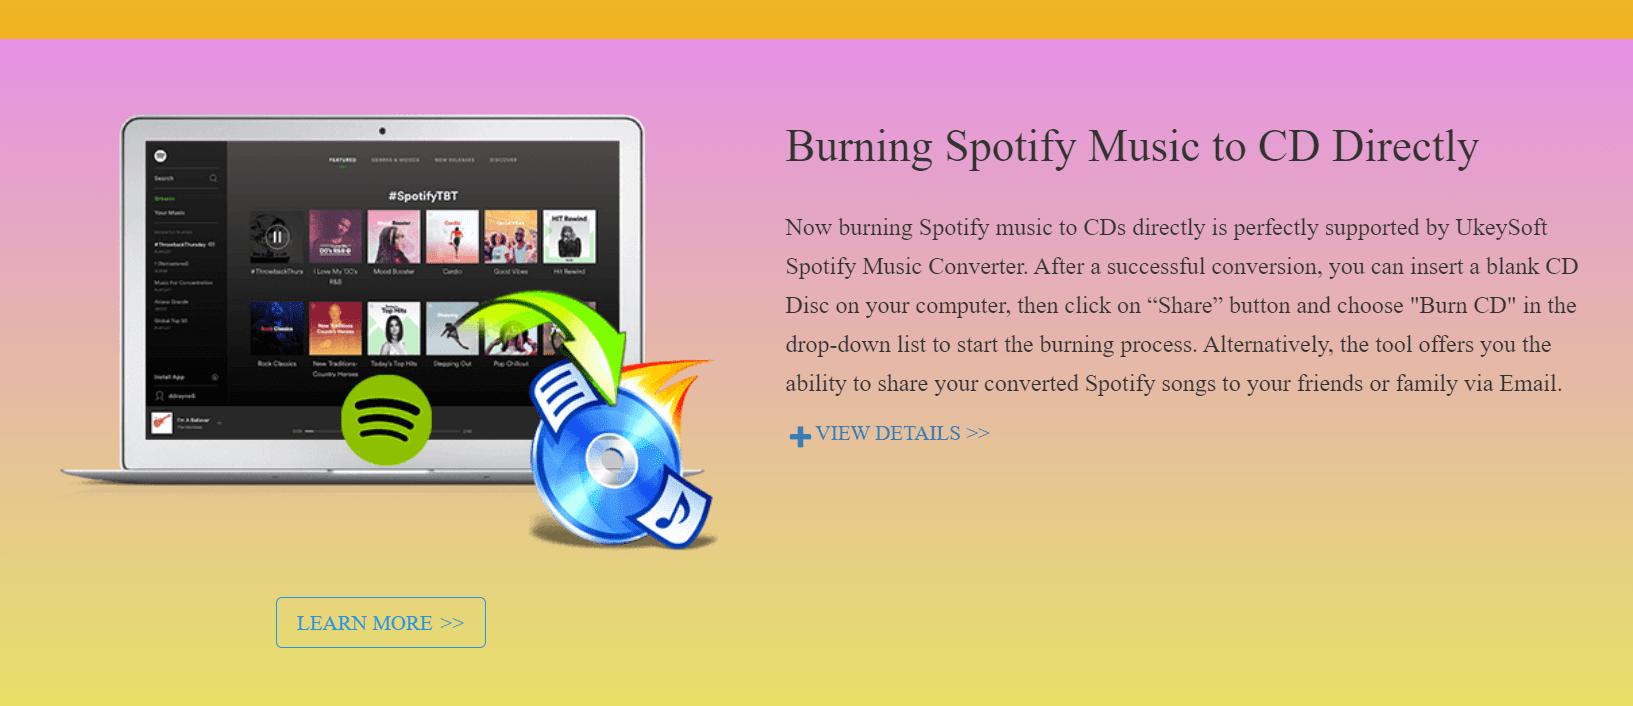 UkeySoft Spotify Music Converter cd